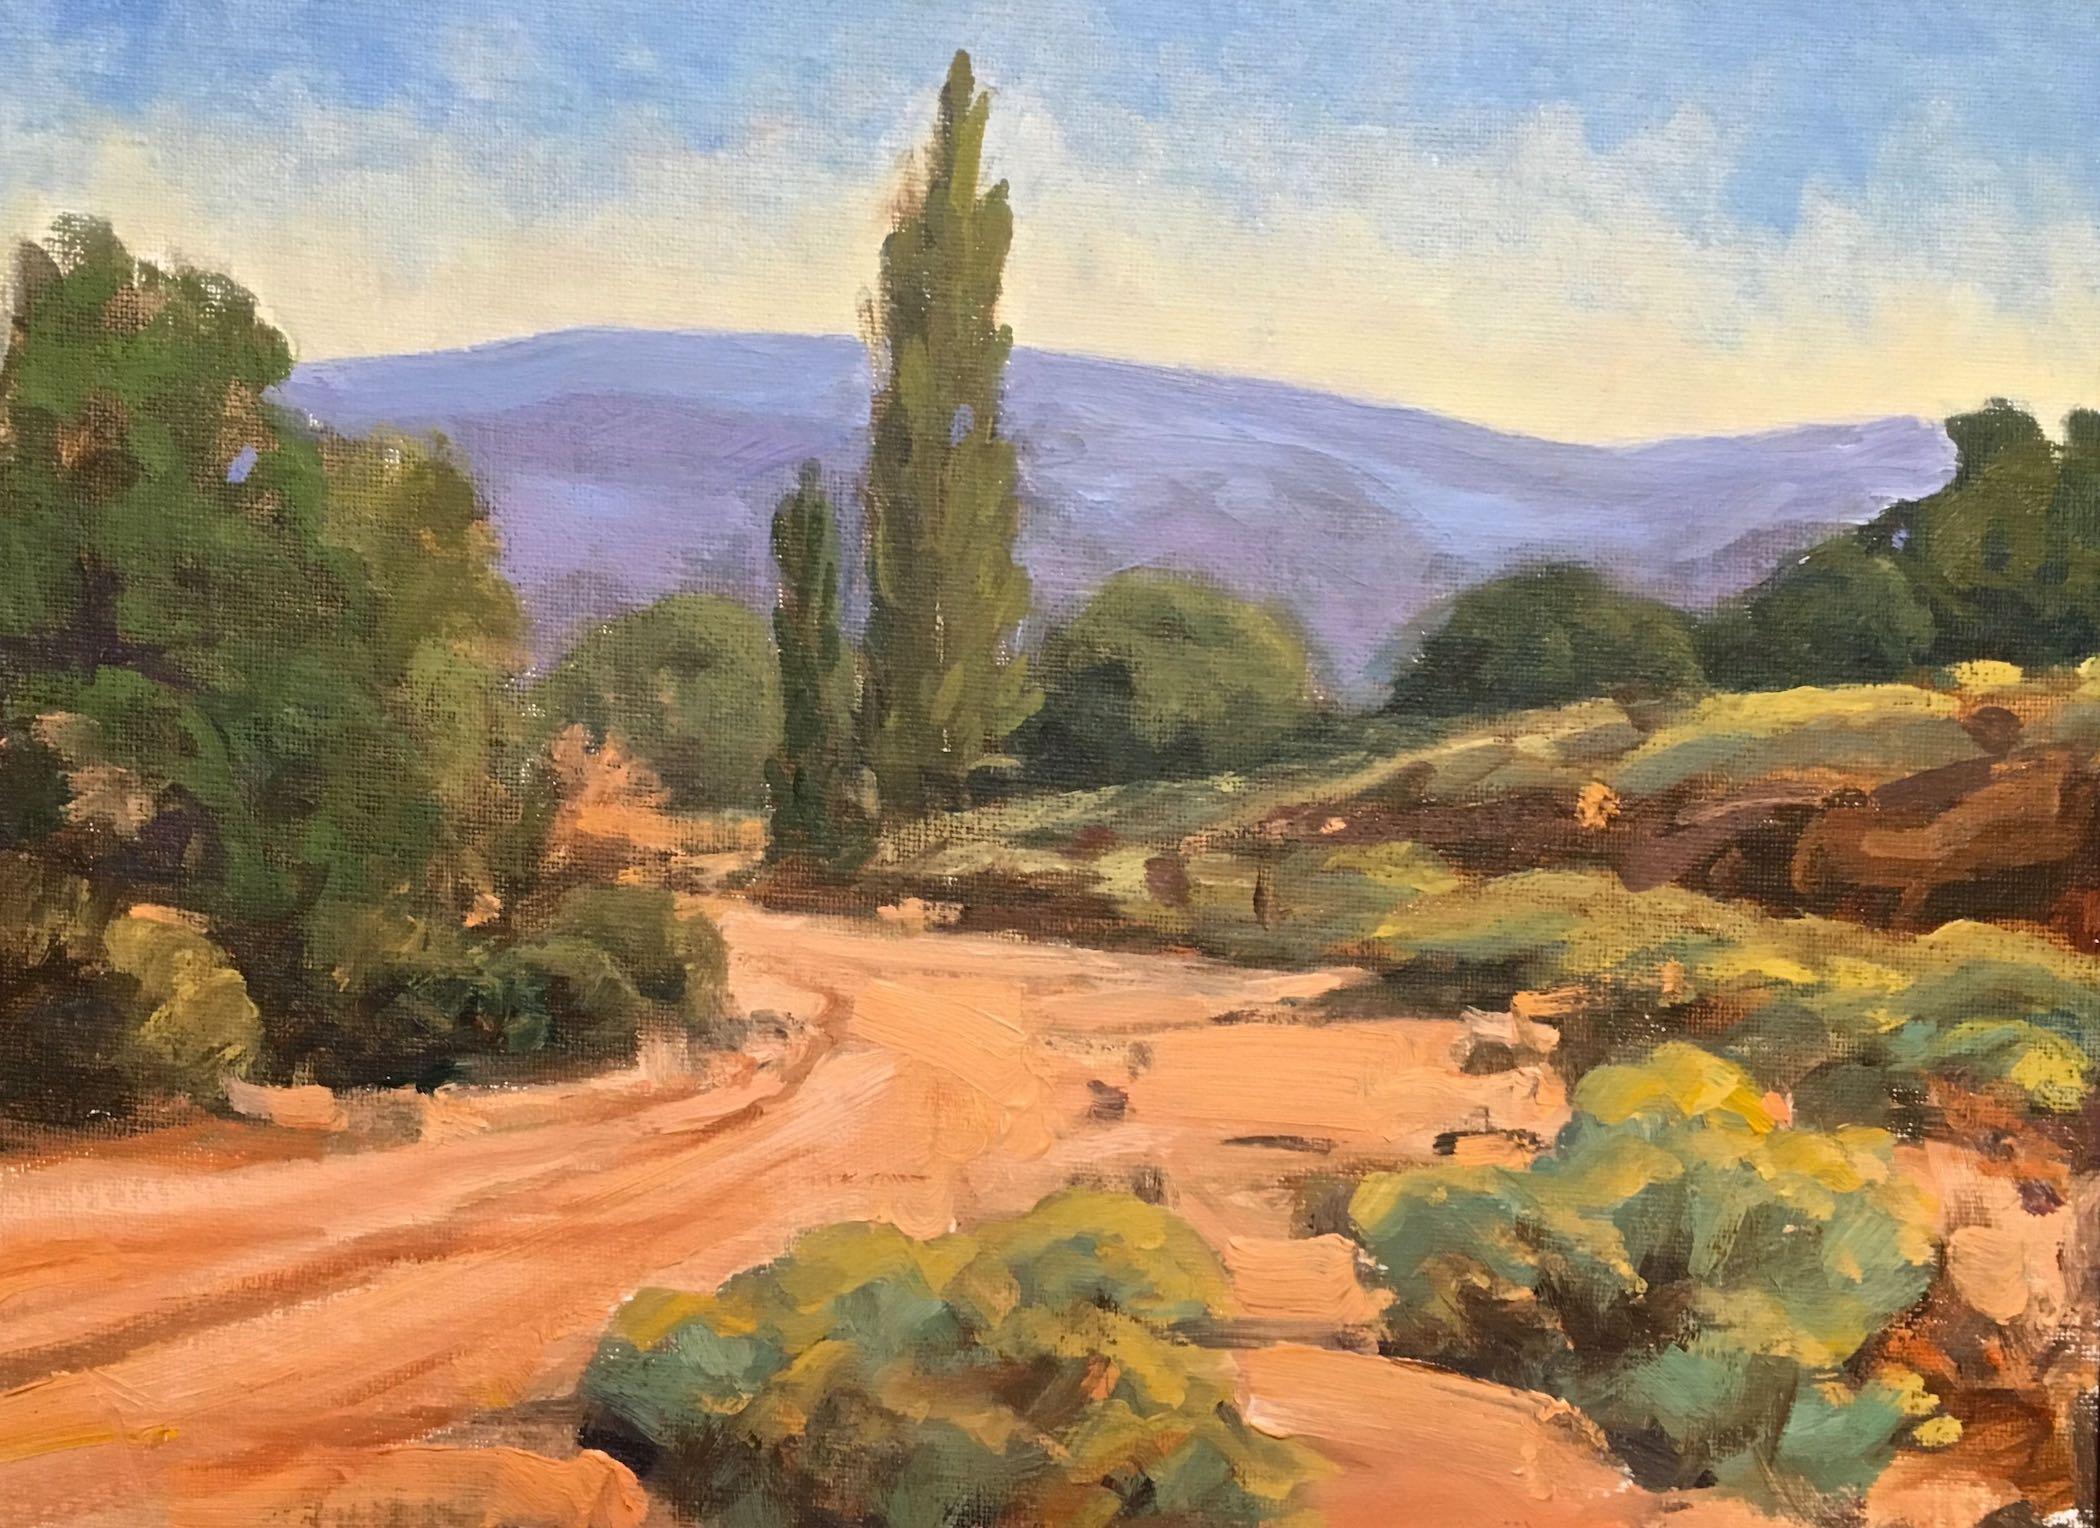 Chris Miller: New Mexico Summer